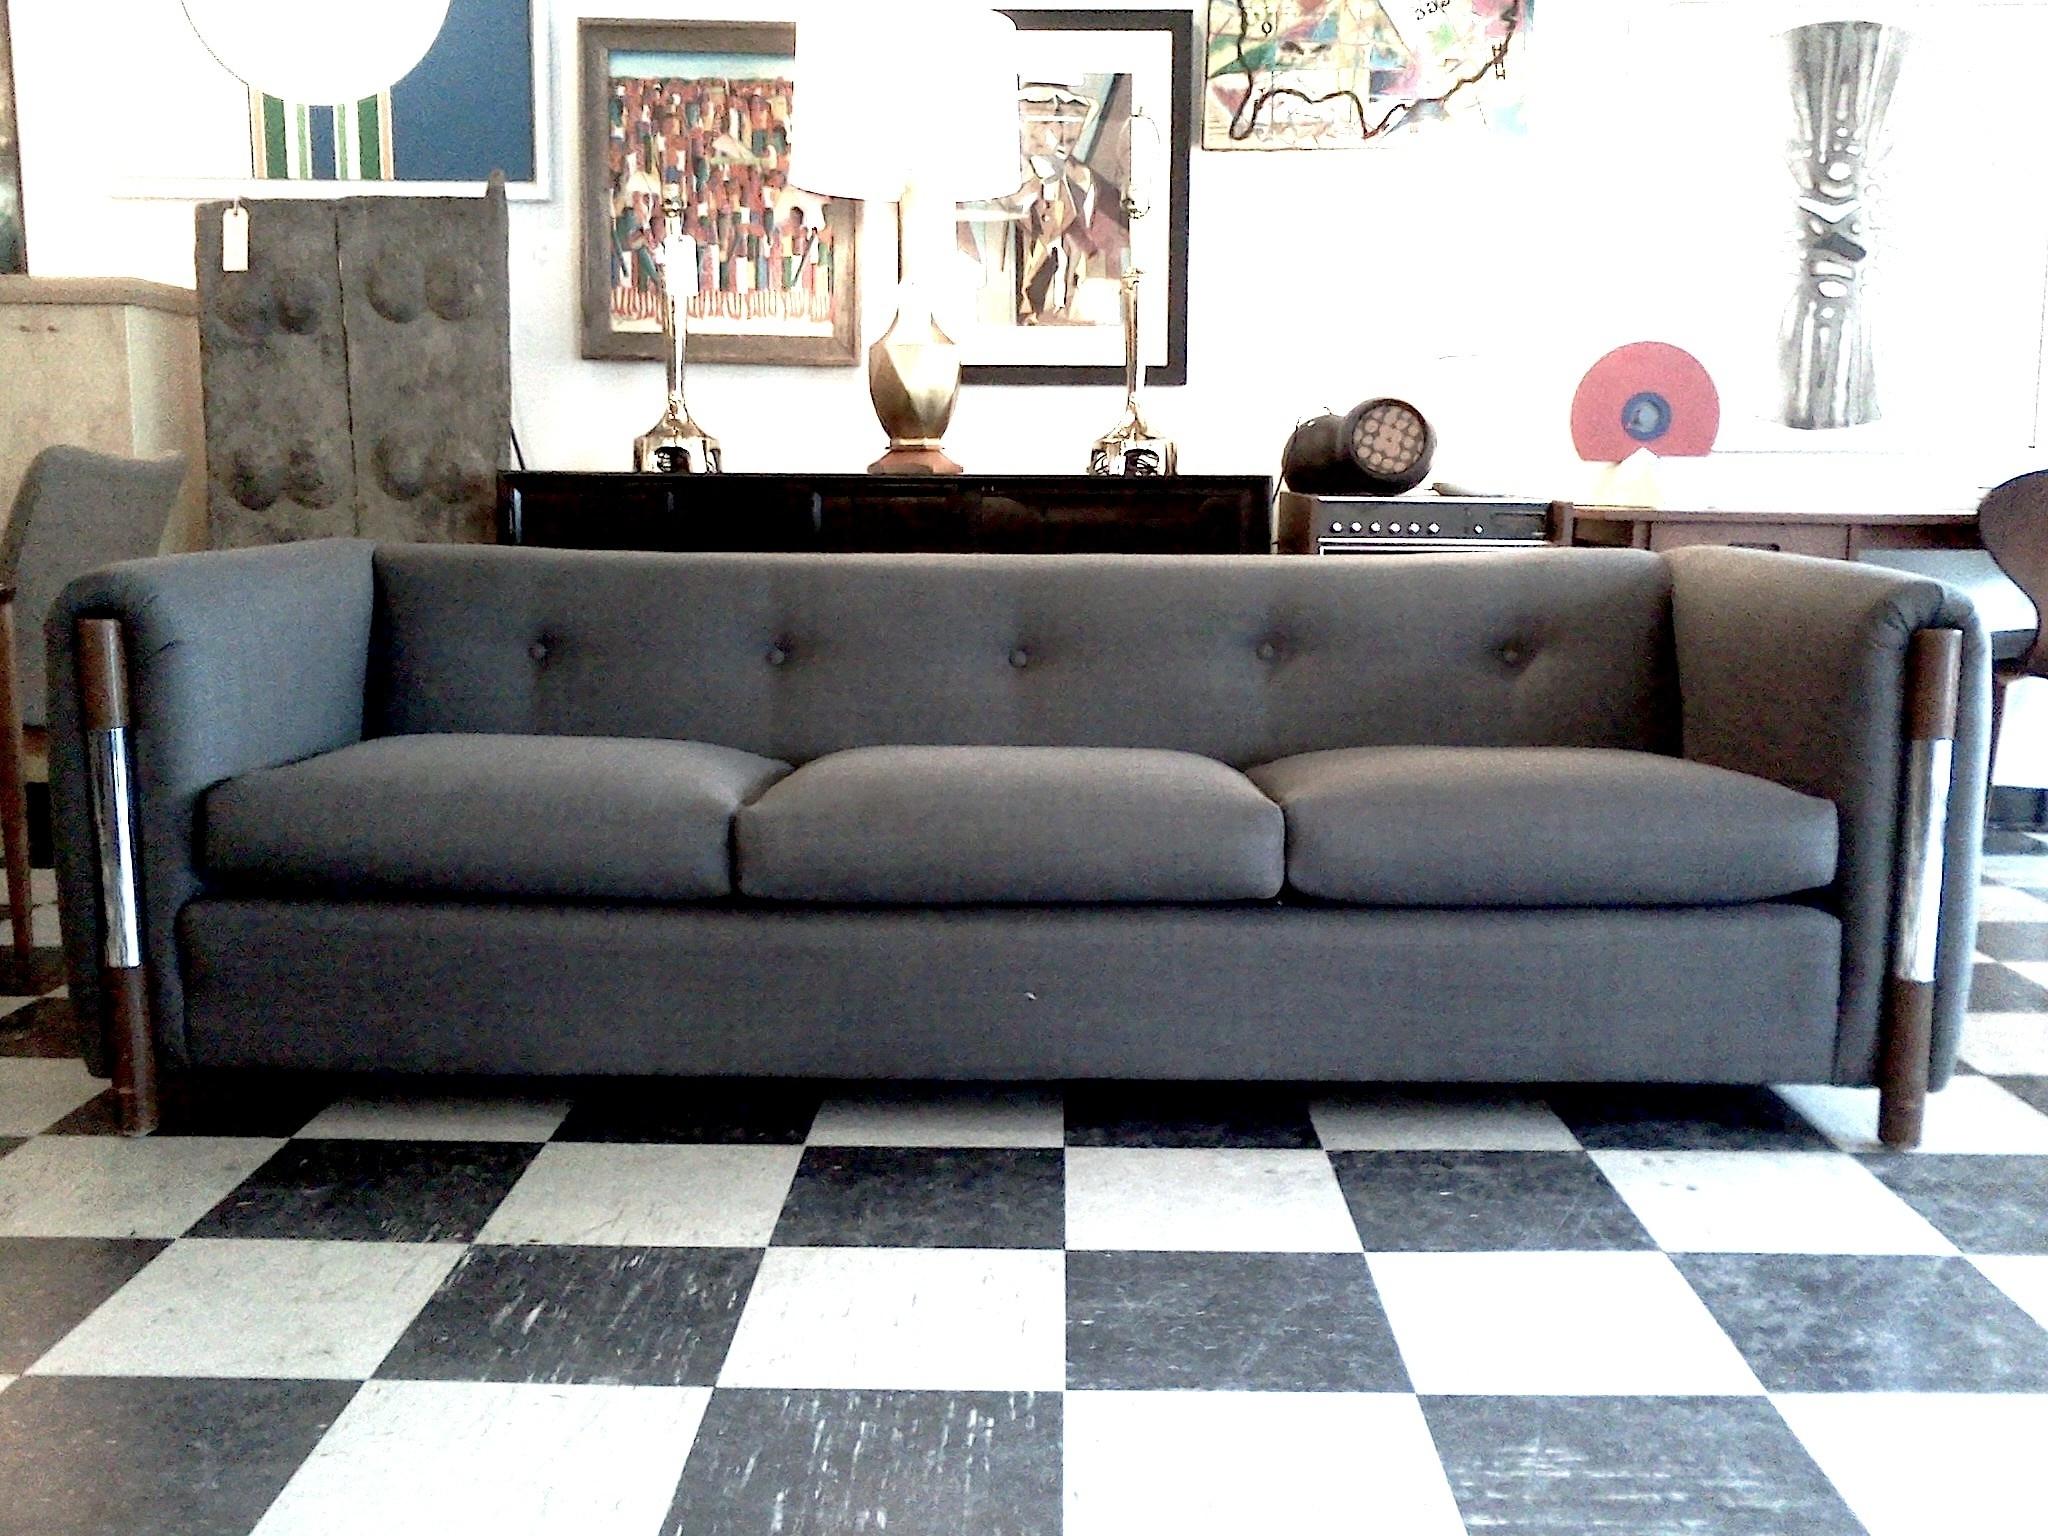 Preferred Richmond Va Sectional Sofas With Regard To Powells Furniture Richmond Va Rooms To Go Midlothian Va Sofa (View 15 of 20)